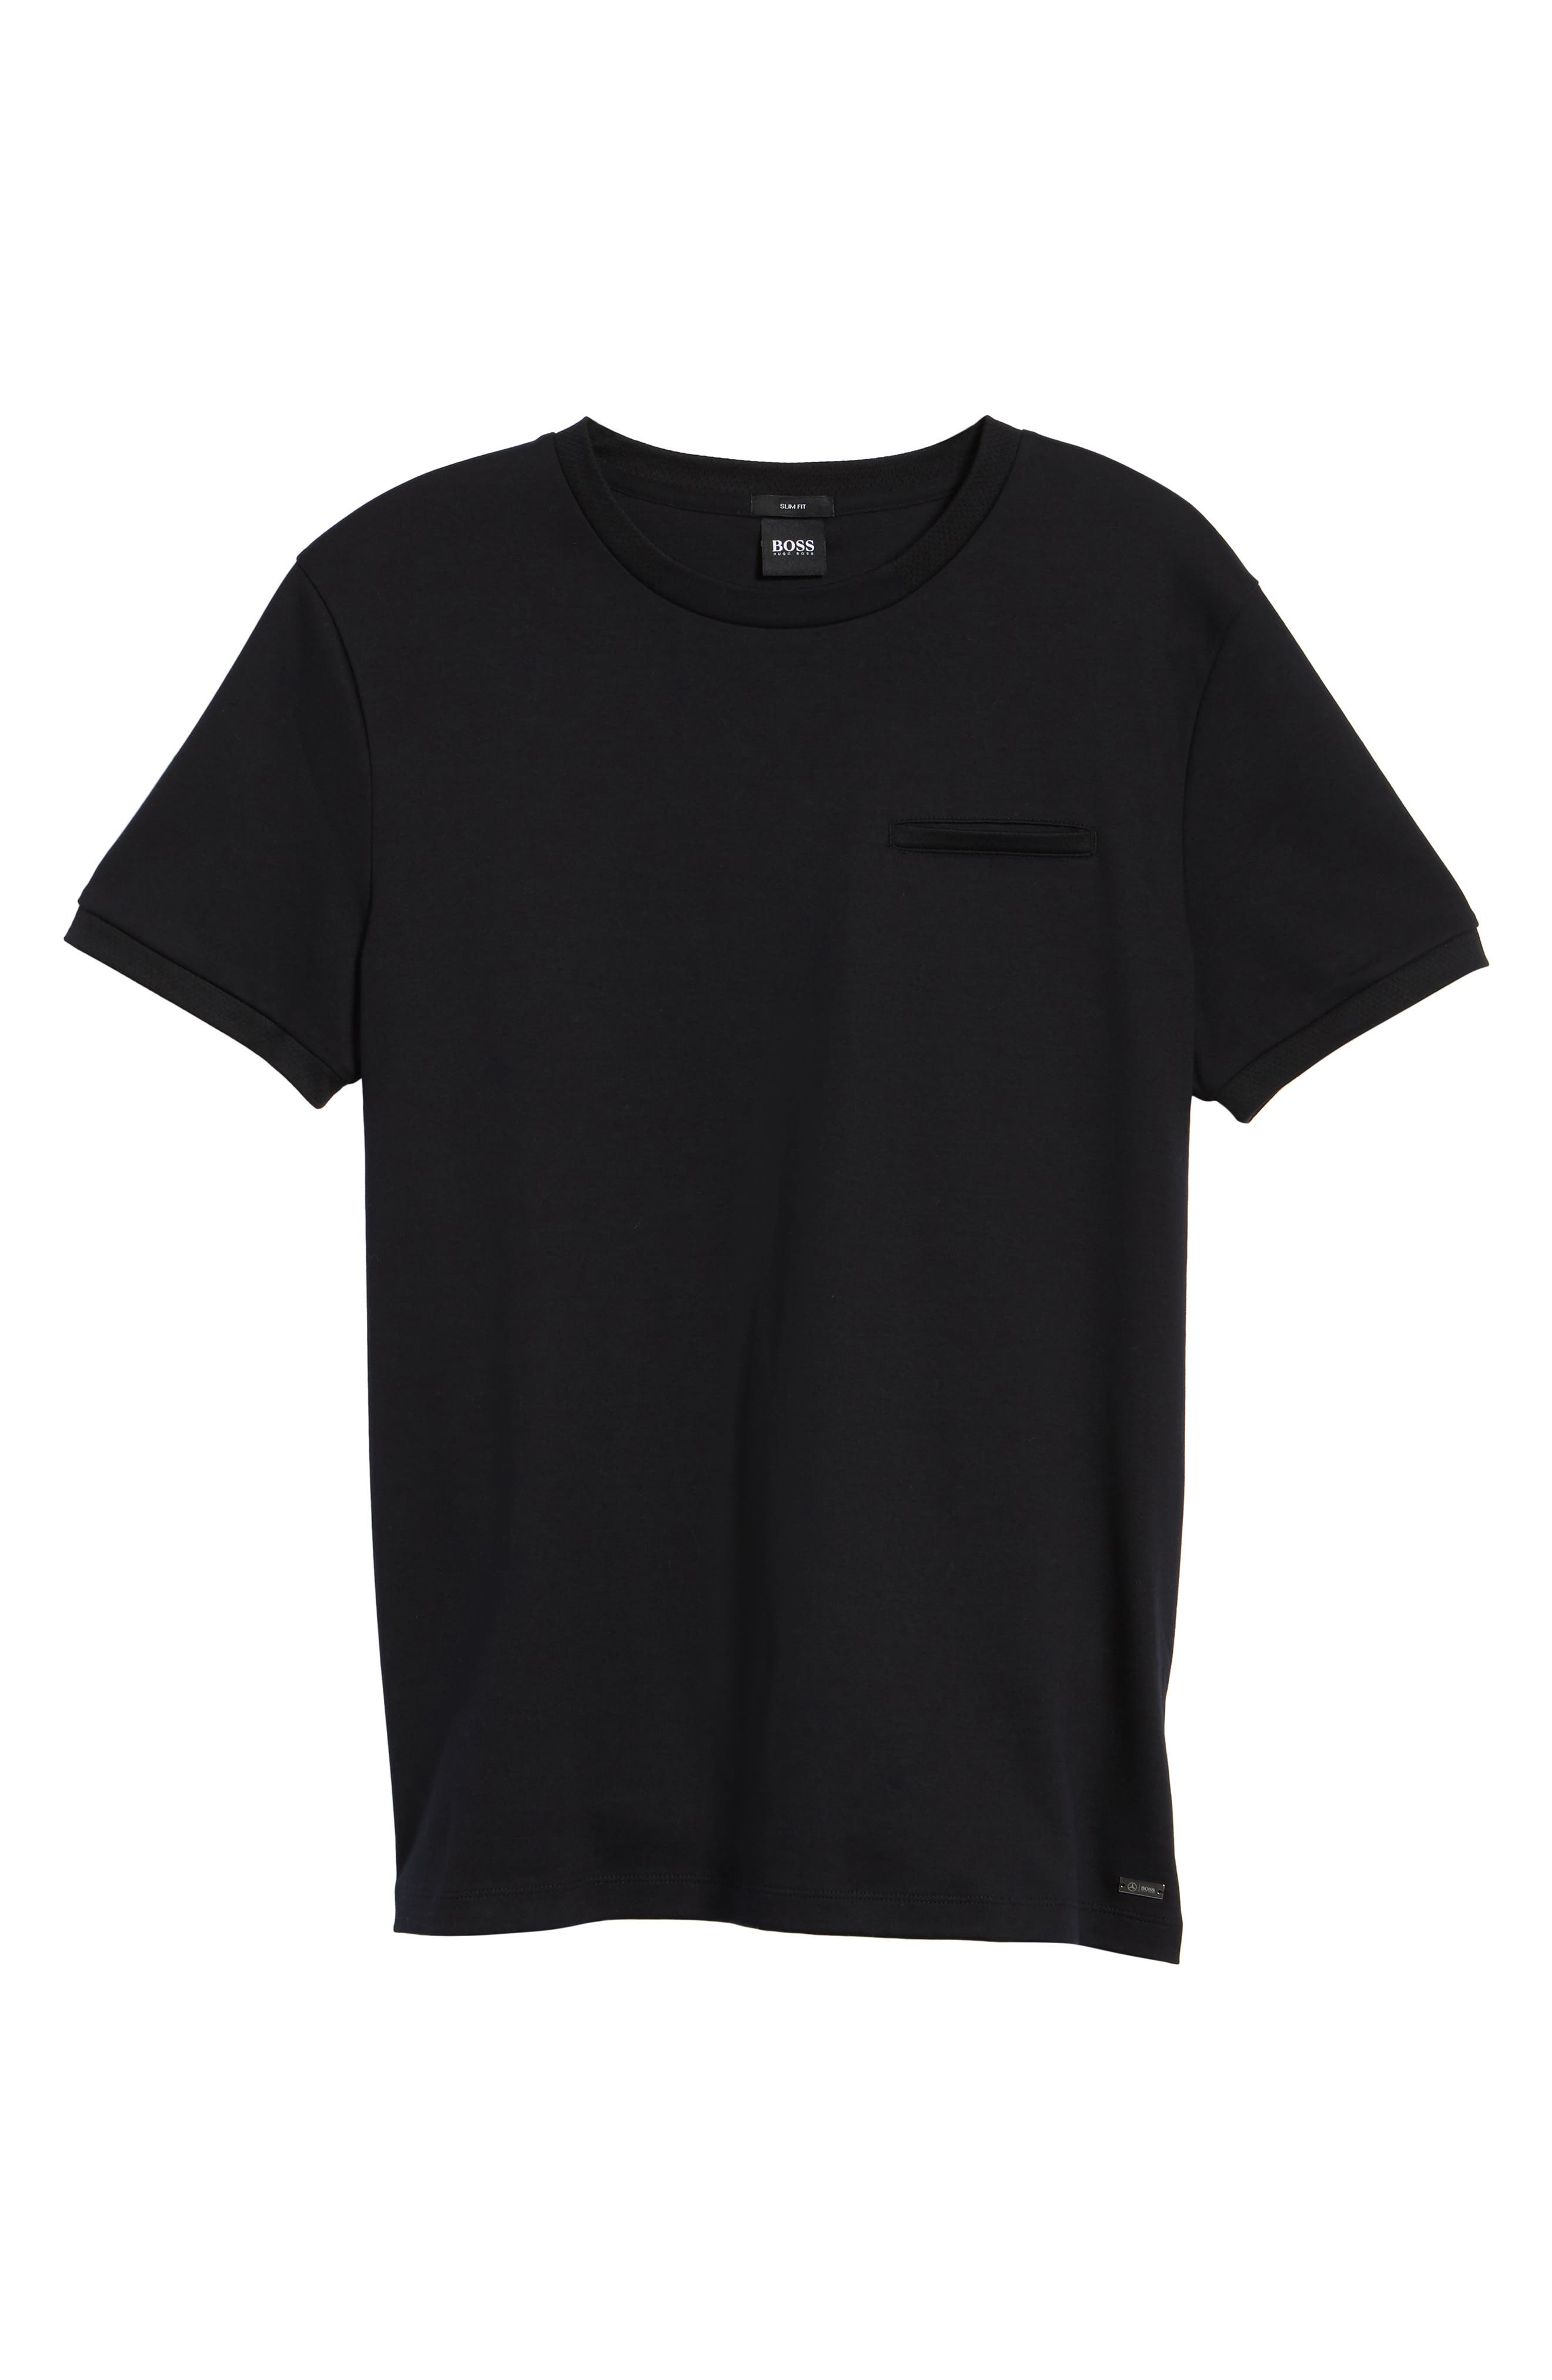 Tessler Mercedes Slim Fit Crewneck T-Shirt,                             Alternate thumbnail 6, color,                             001